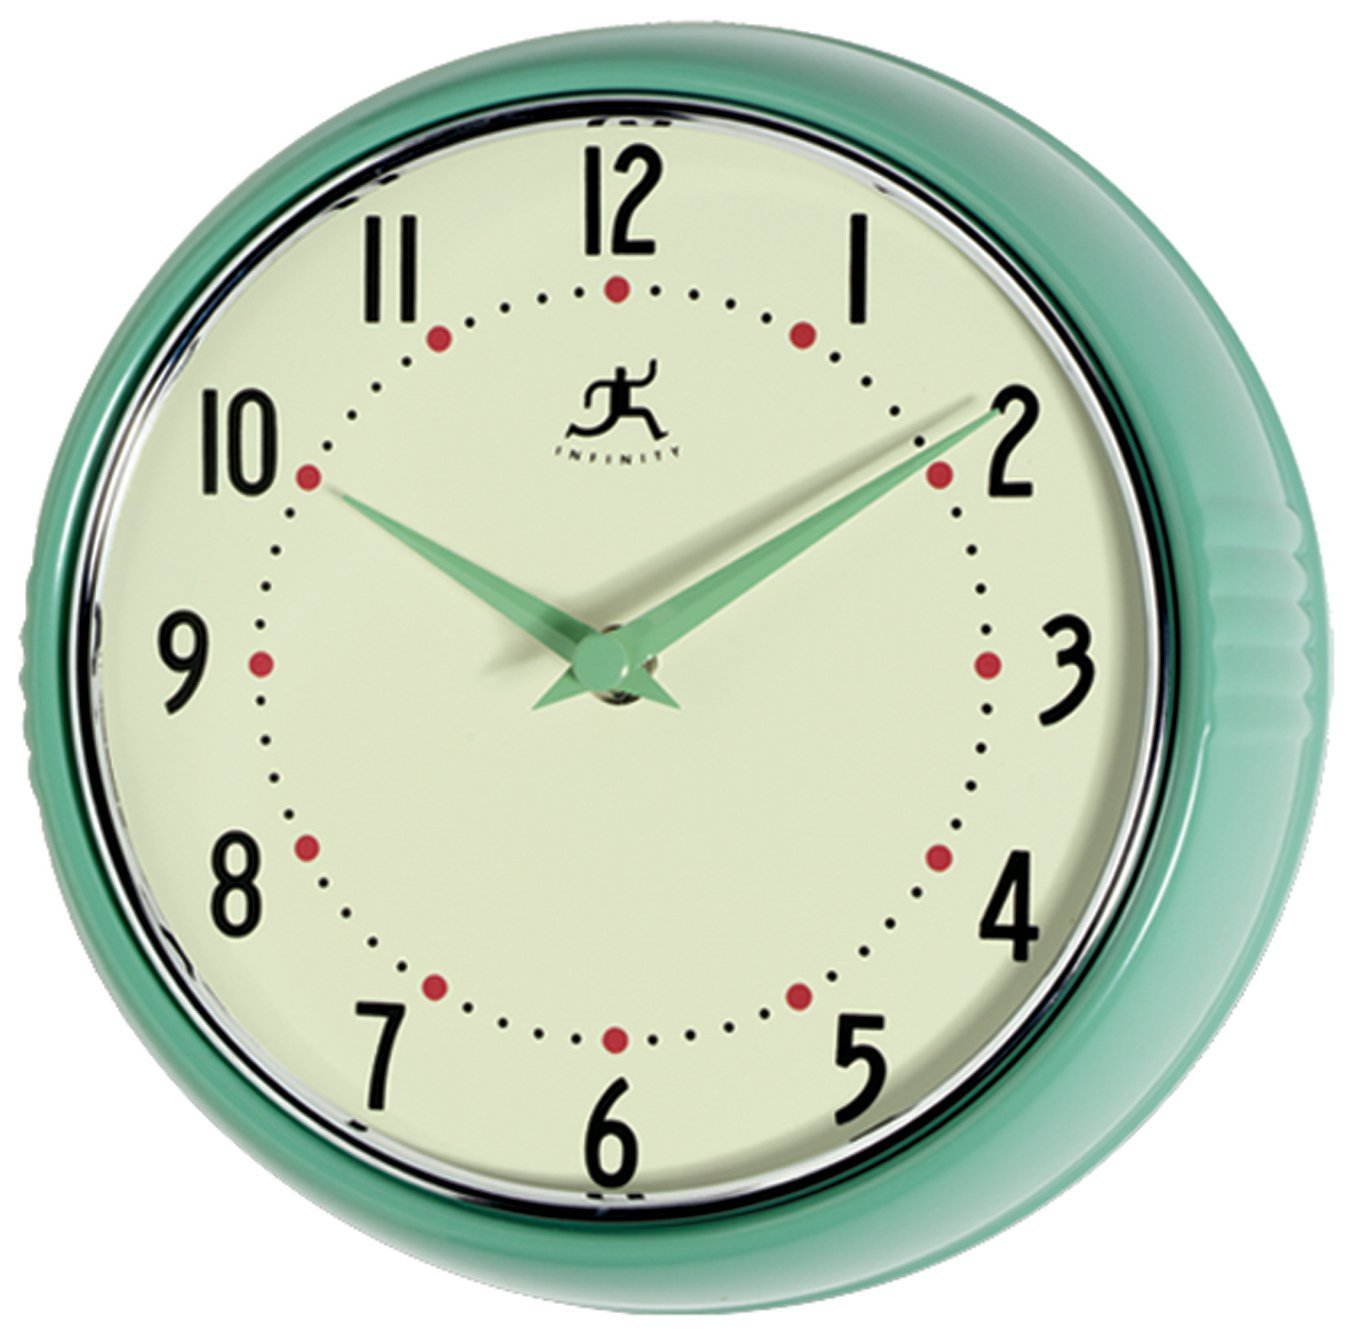 Mint Green Kitchen Accessories Clocks Little House Design